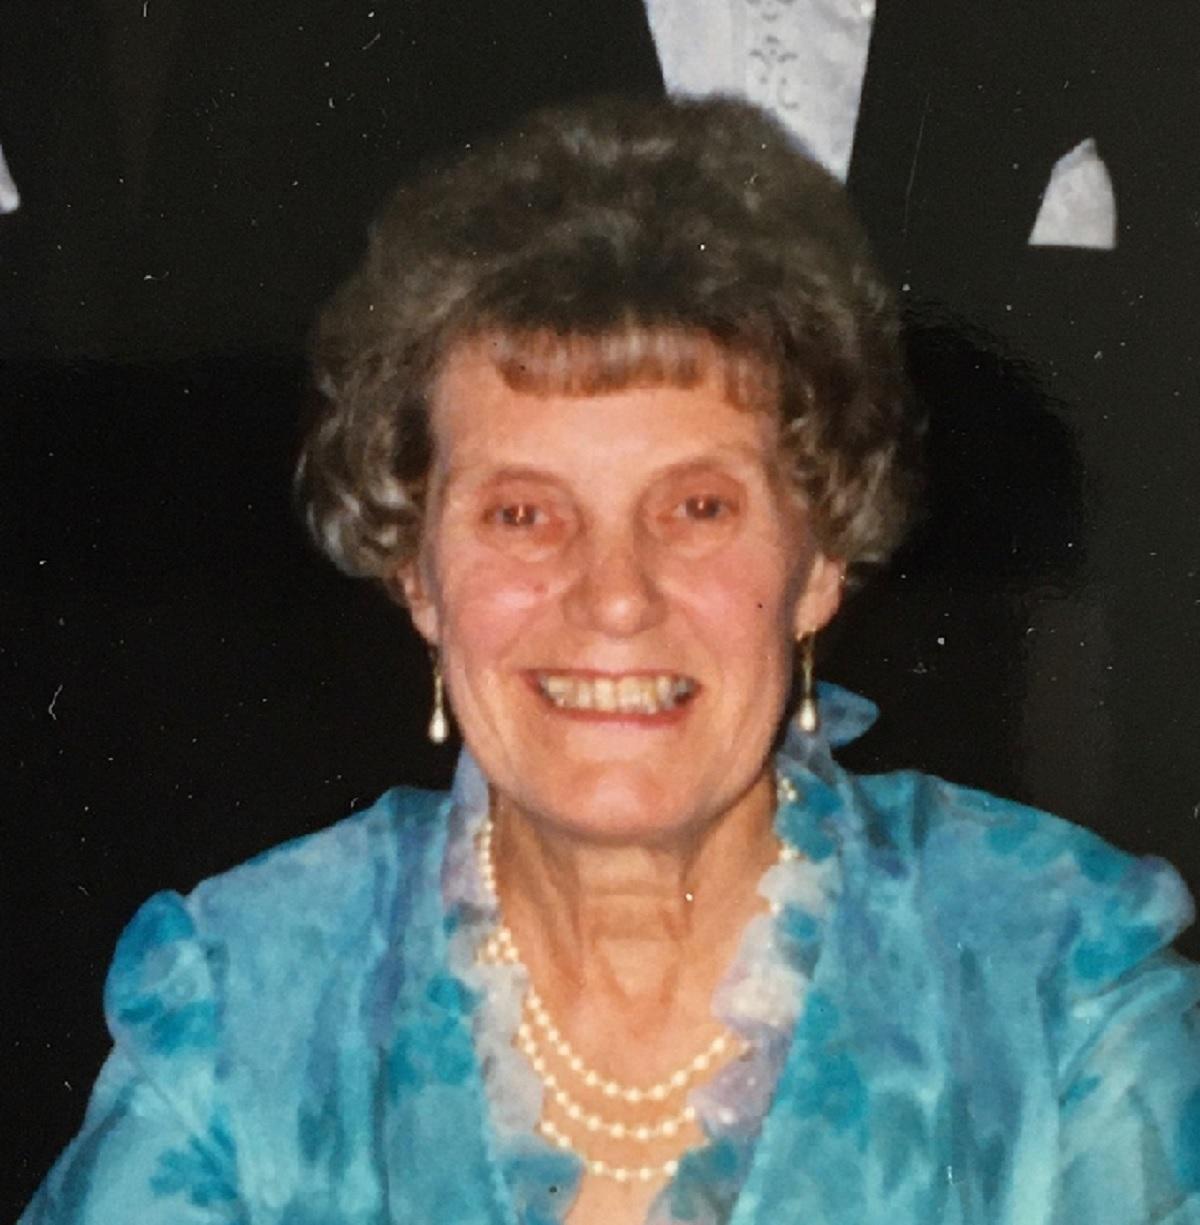 Former WI president Florence Dent dies aged 98